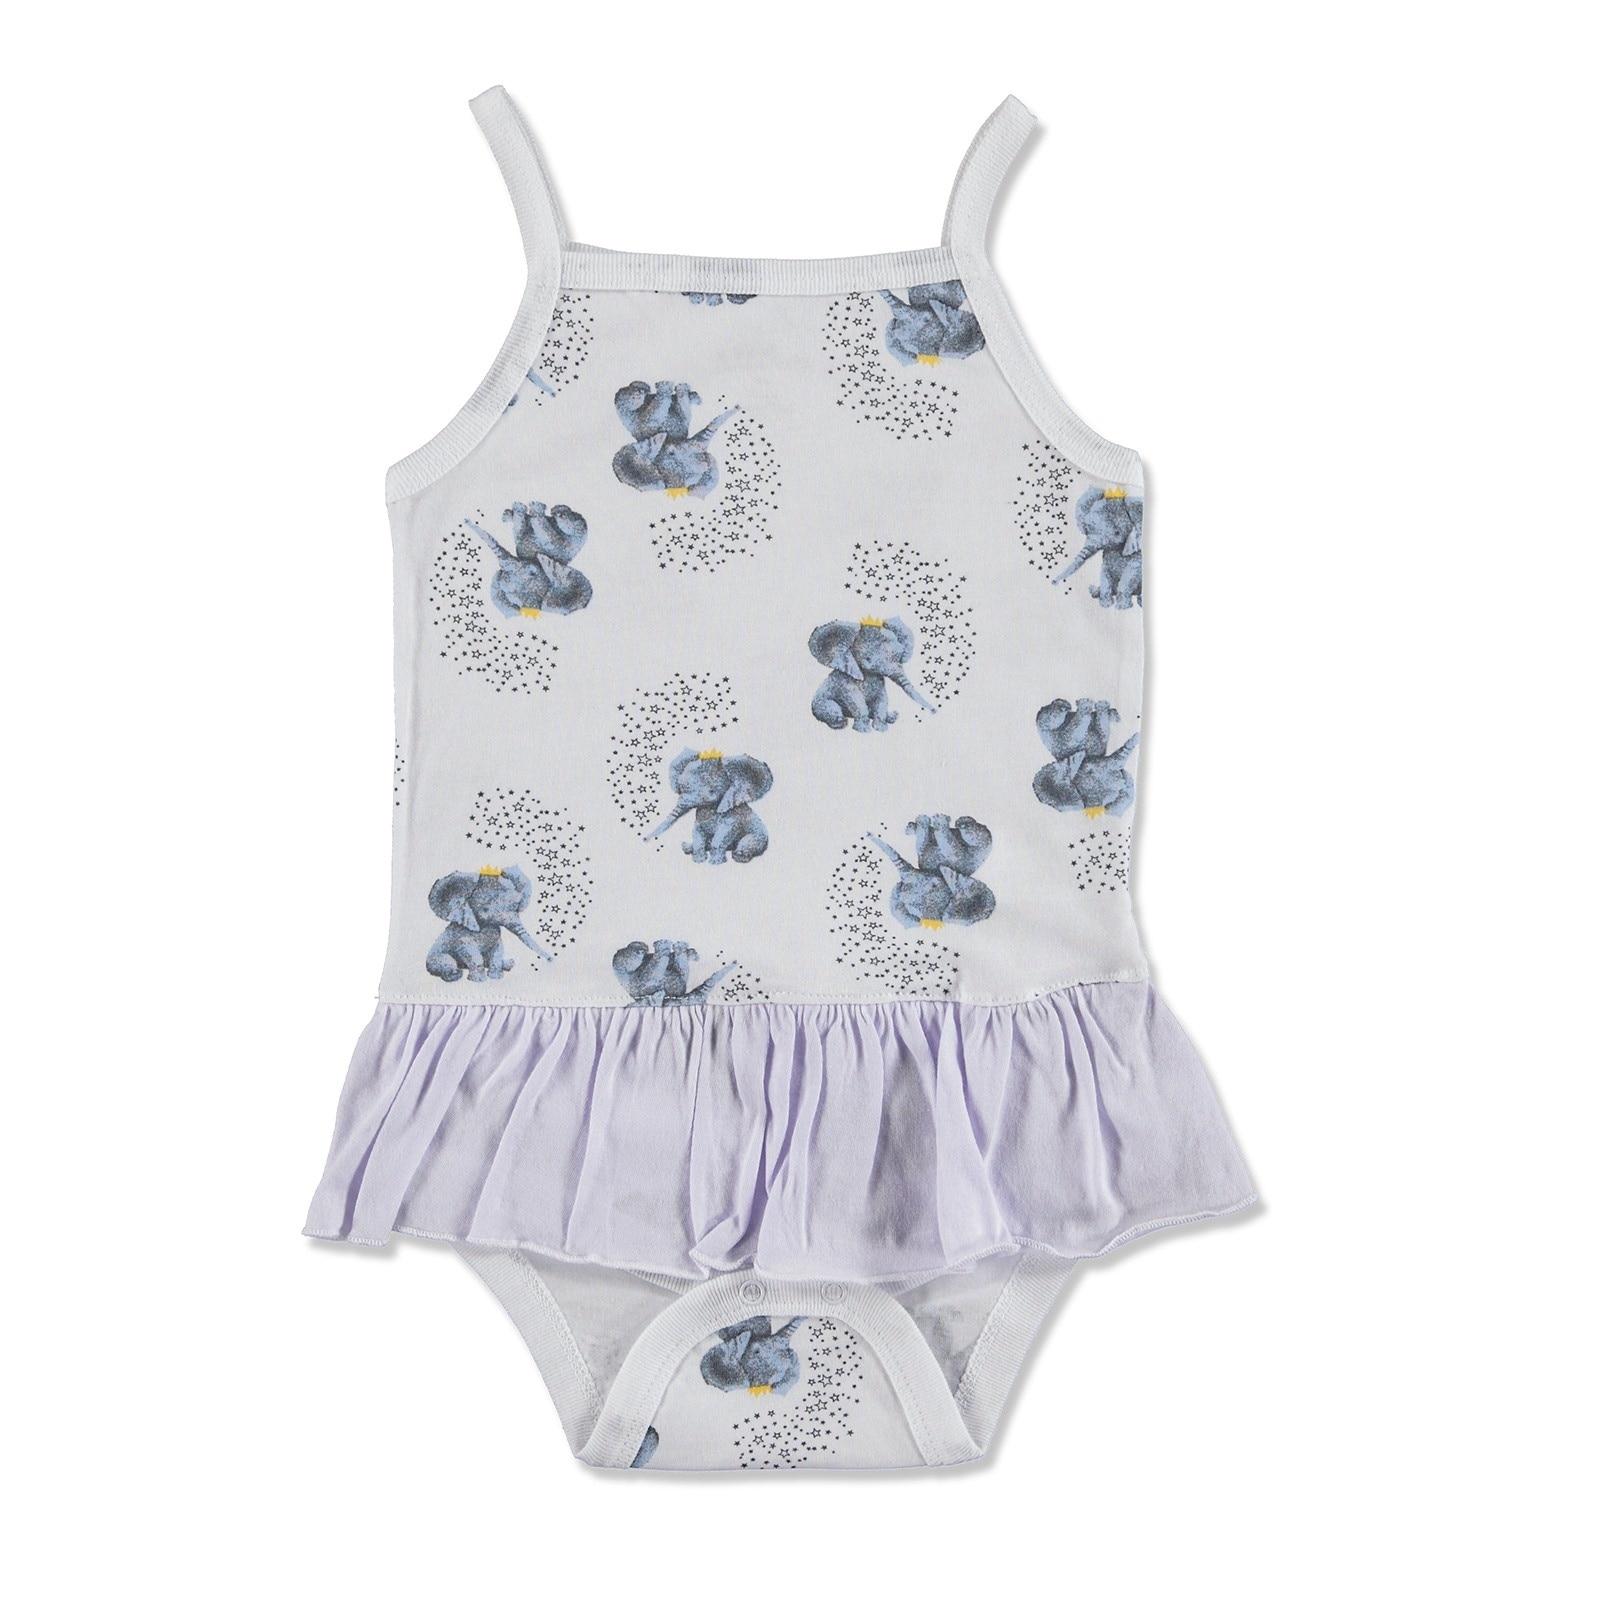 Ebebek Aziz Bebe Summer Baby Girl Elephant Supreme Rope Strap Bodysuit